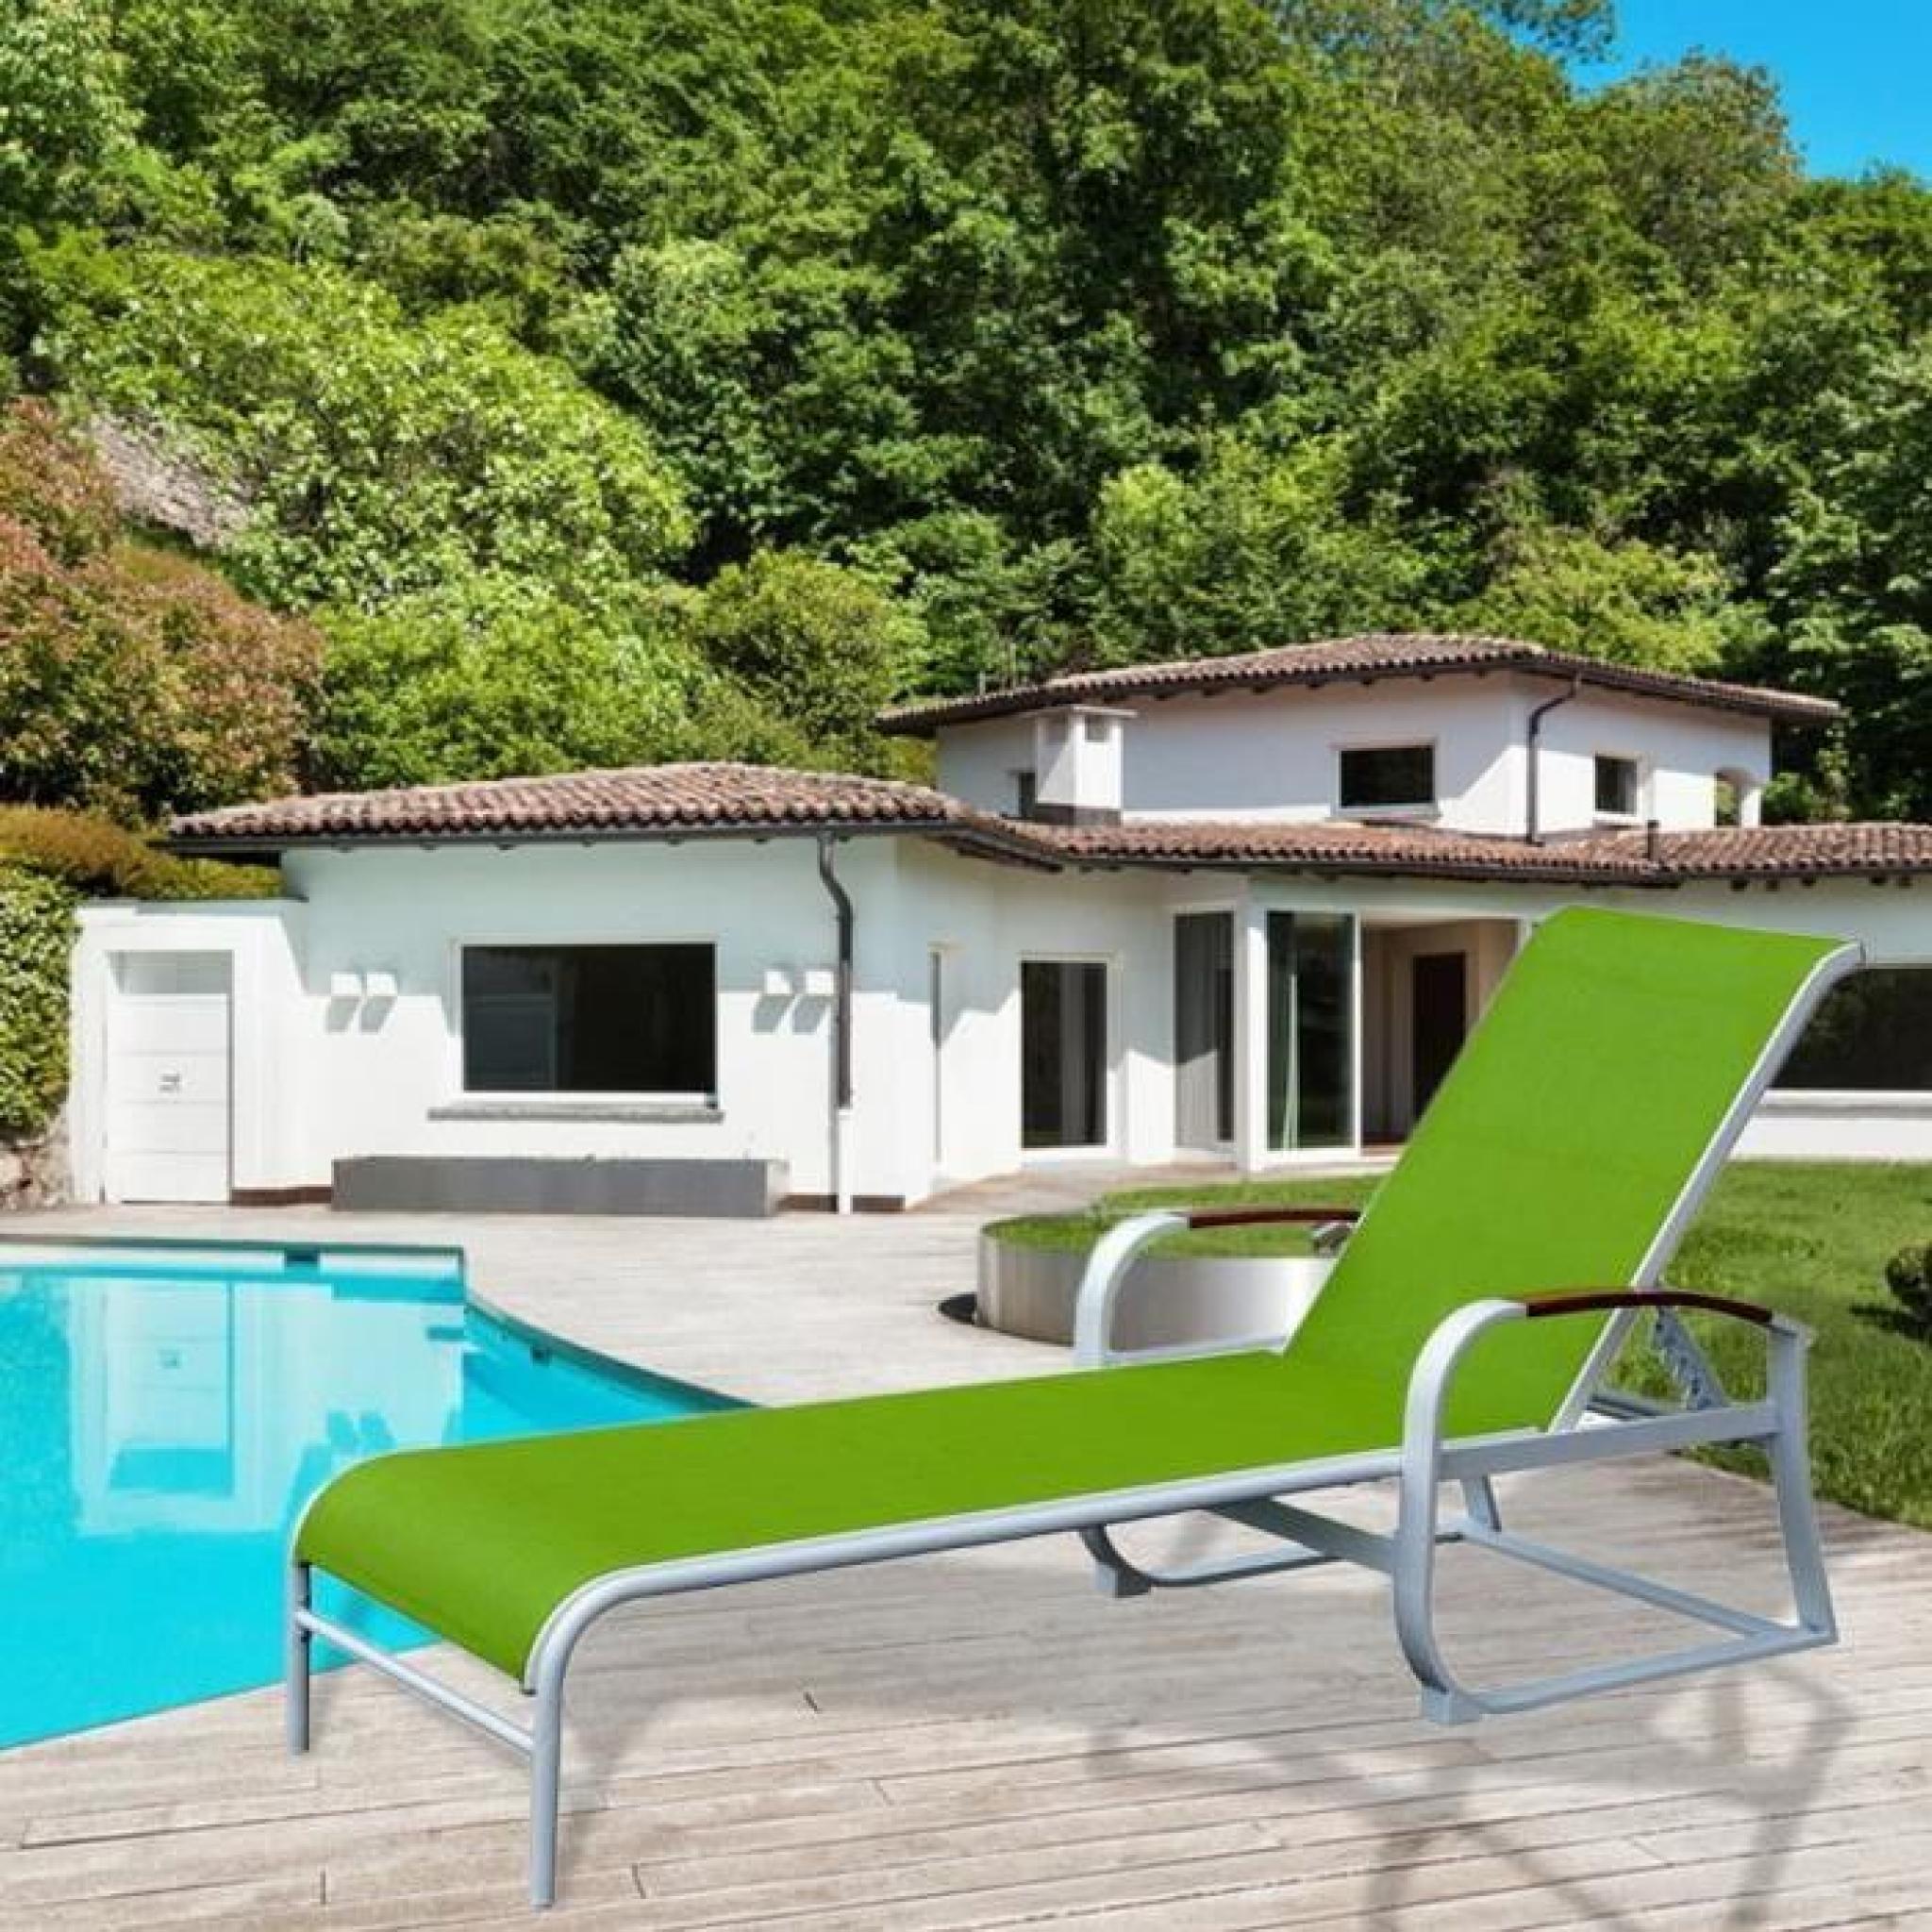 Homdox chaise longue jardin toile tissu acier tube for Chaise longue jardin pas cher